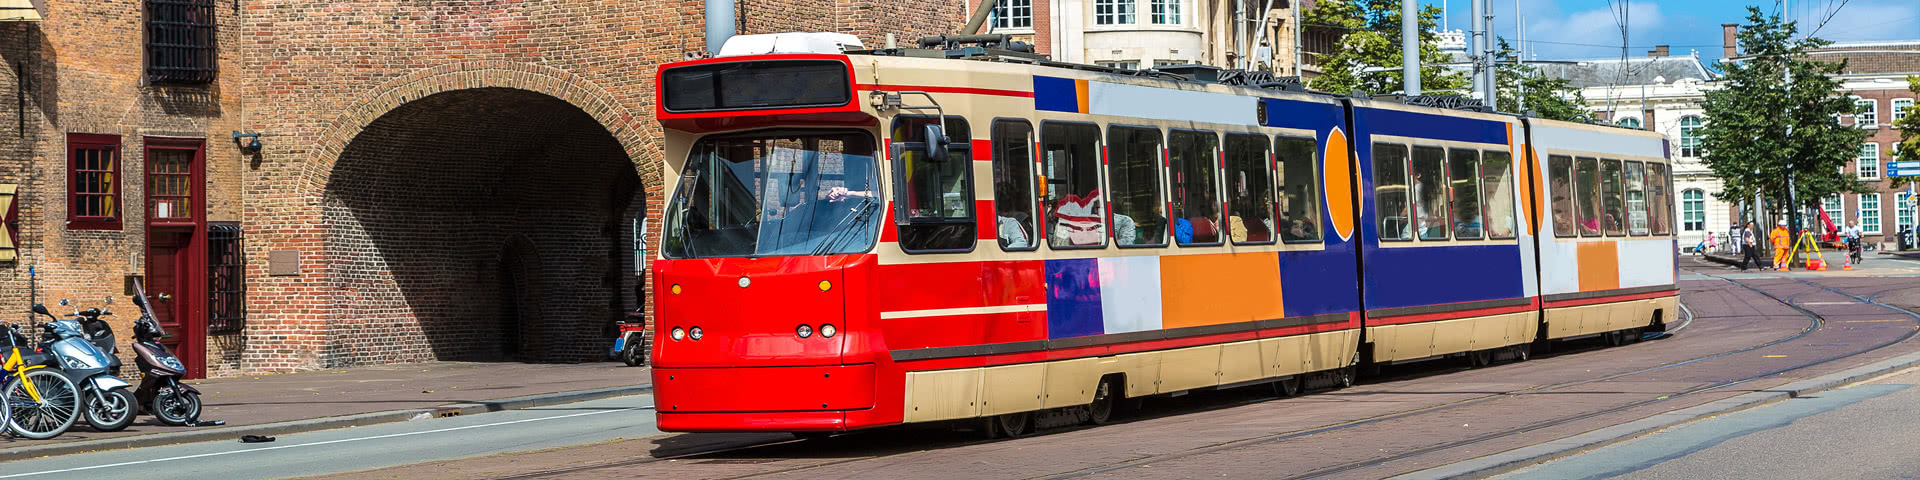 Bunte Straßenbahn fährt durch Den Haag